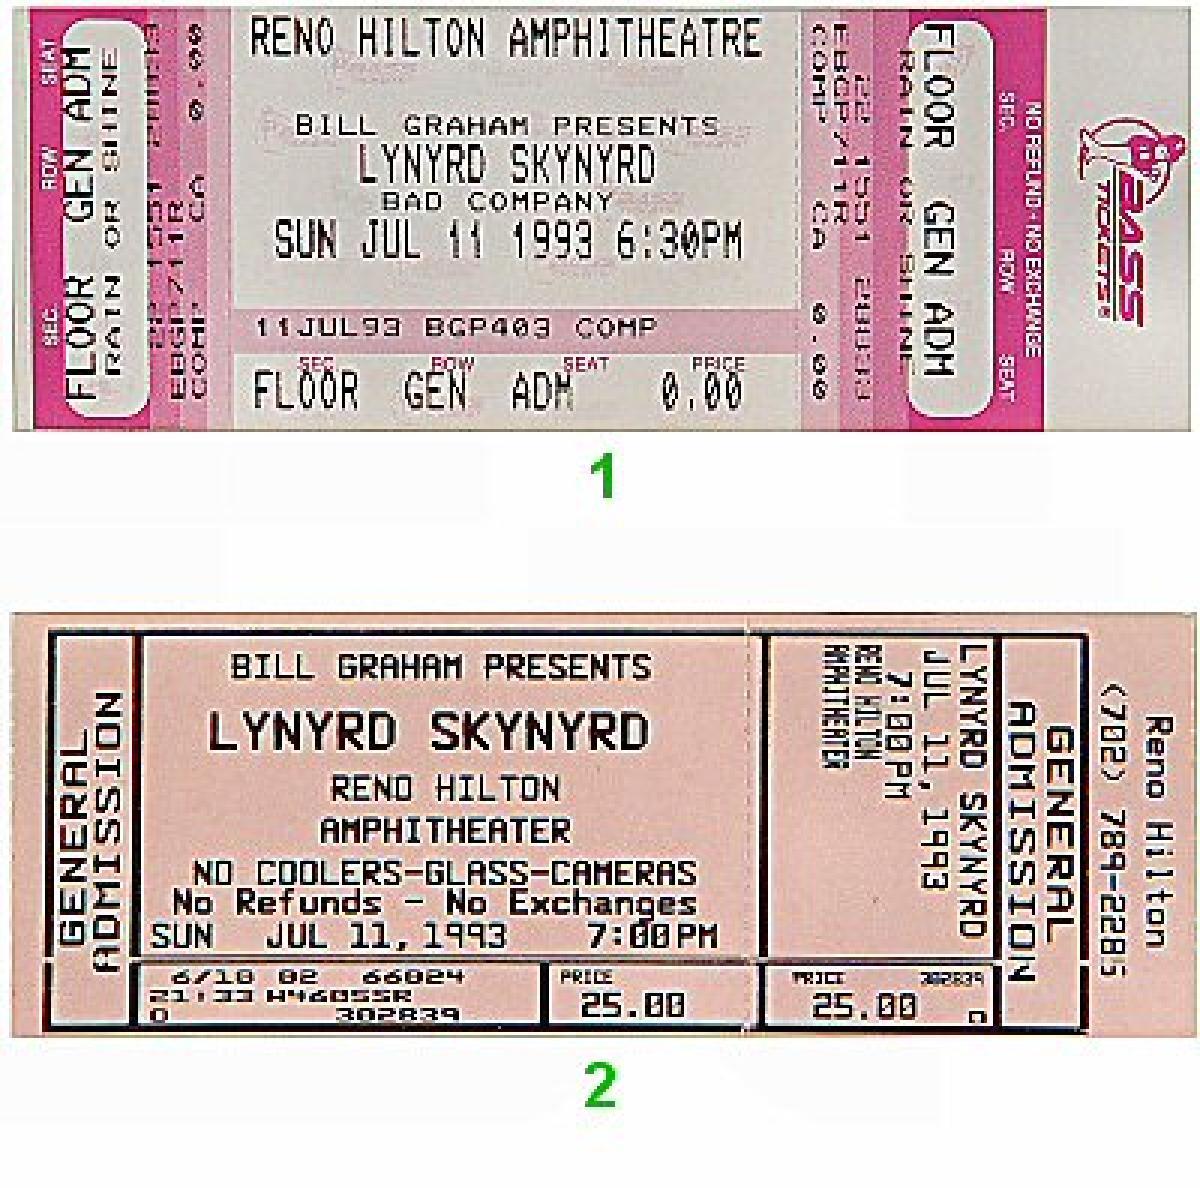 lynyrd skynyrd vintage concert vintage ticket from reno hilton amphitheatre jul 11 1993 at. Black Bedroom Furniture Sets. Home Design Ideas